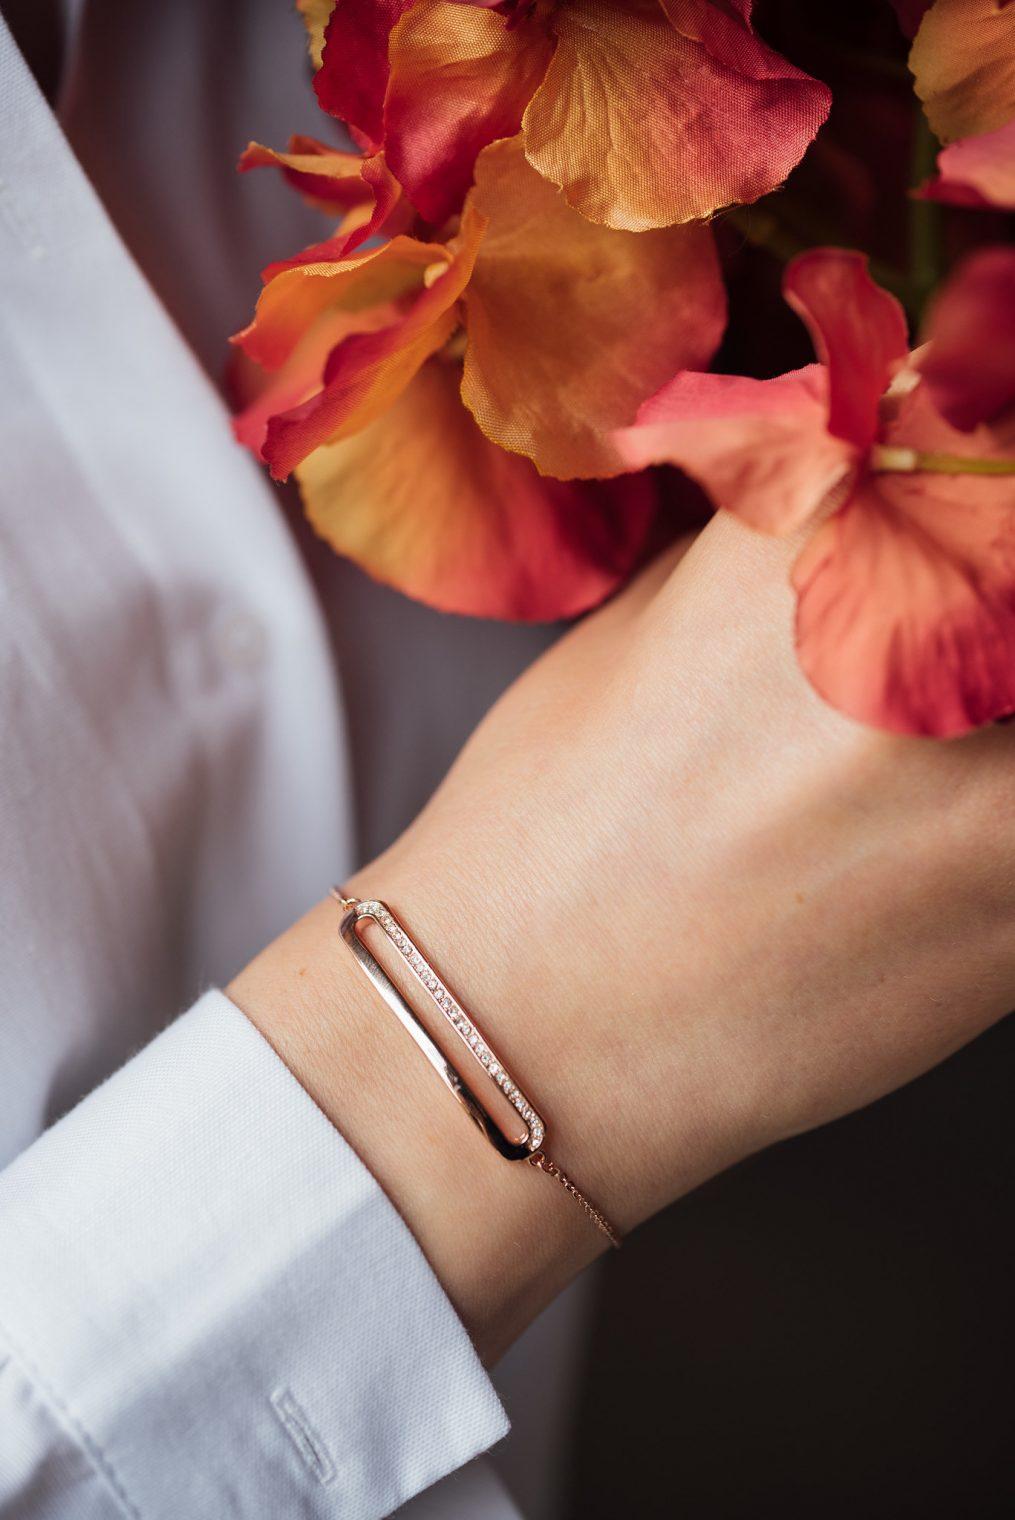 Kaytie Wu rose gold bracelet with Swarovski crystals